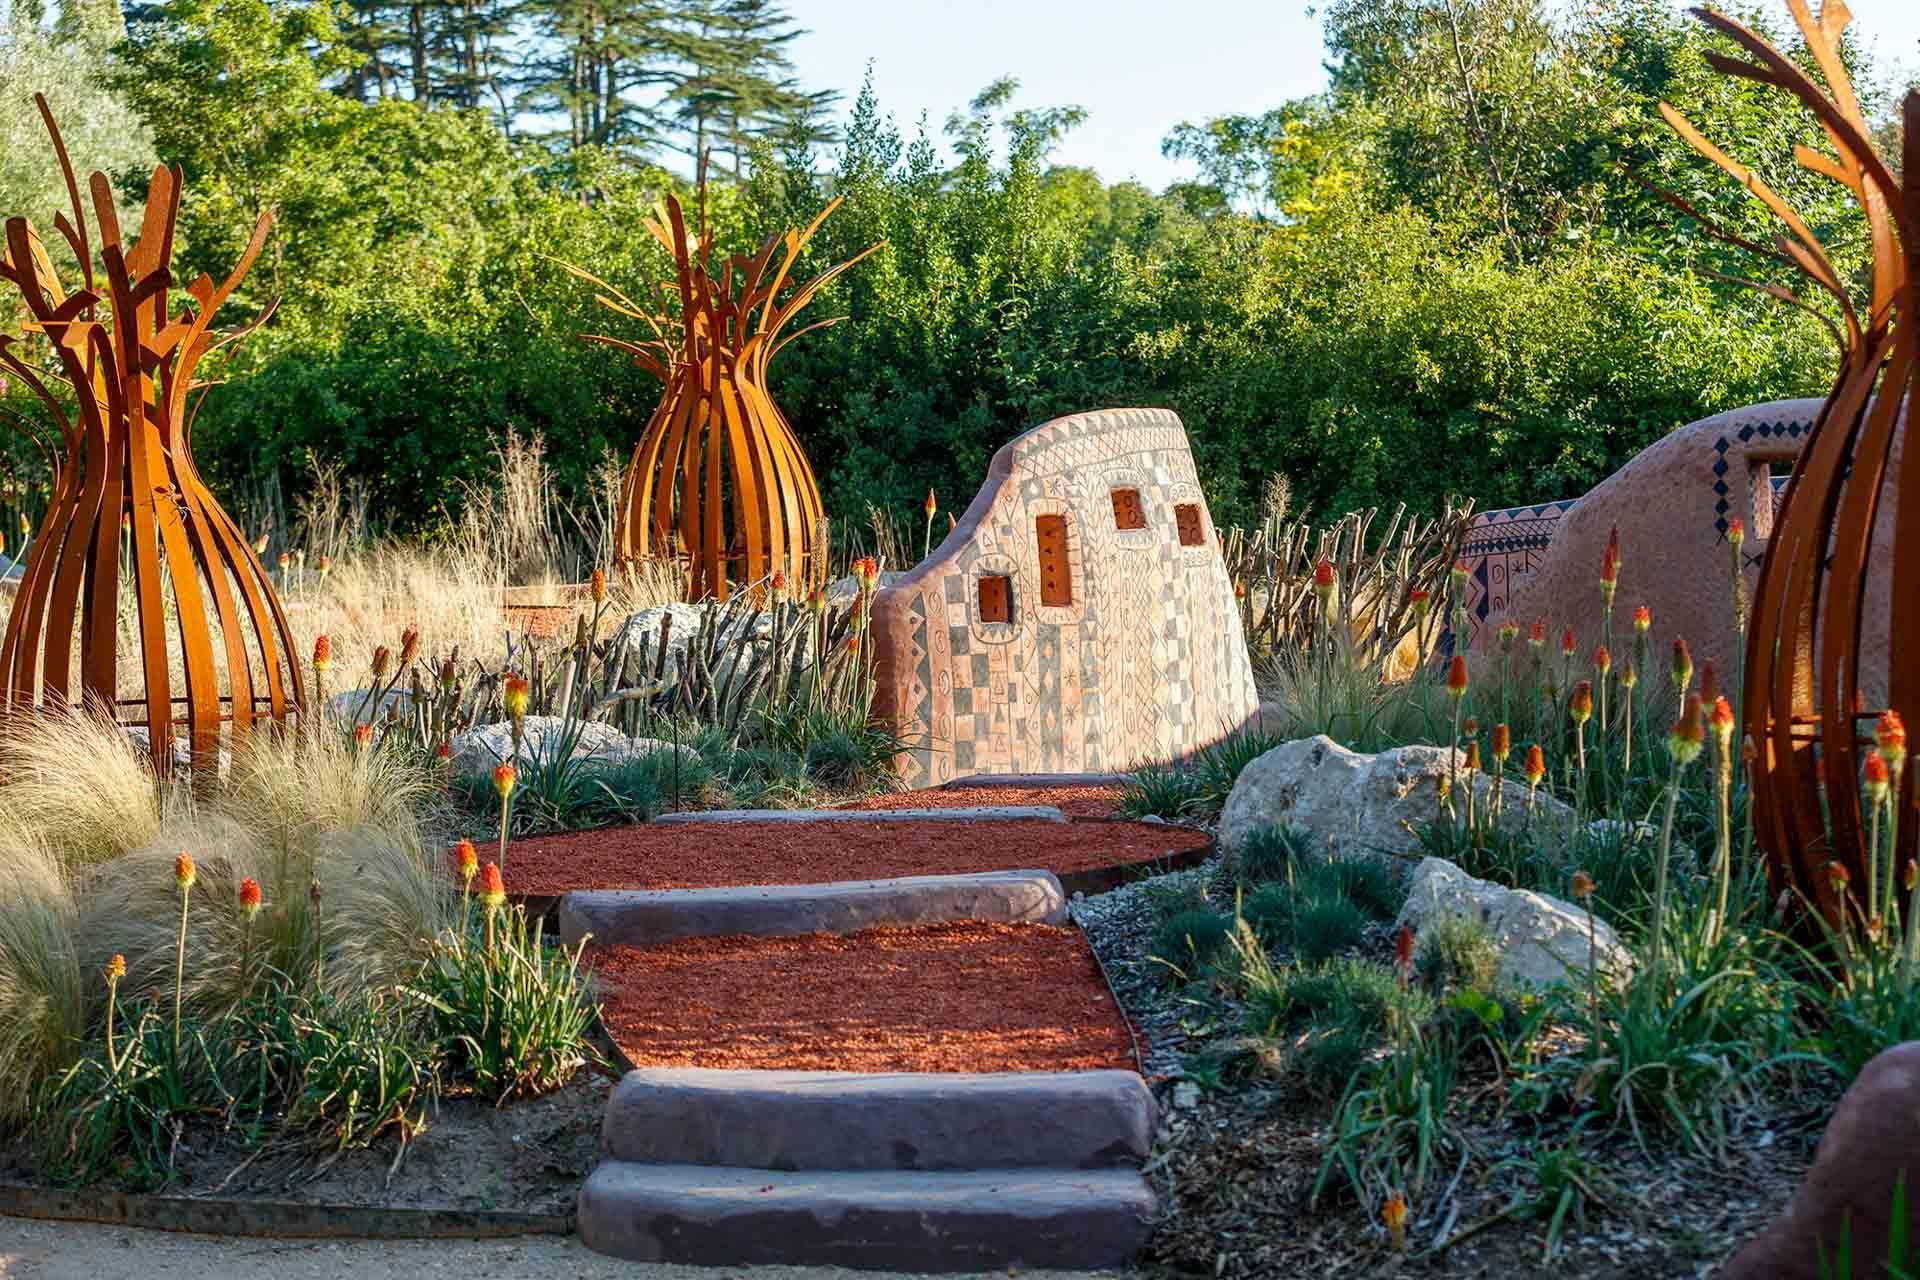 Sous le soleil africain, jardin de Leon Kluge, Festival International des Jardins 2020 © Éric Sander